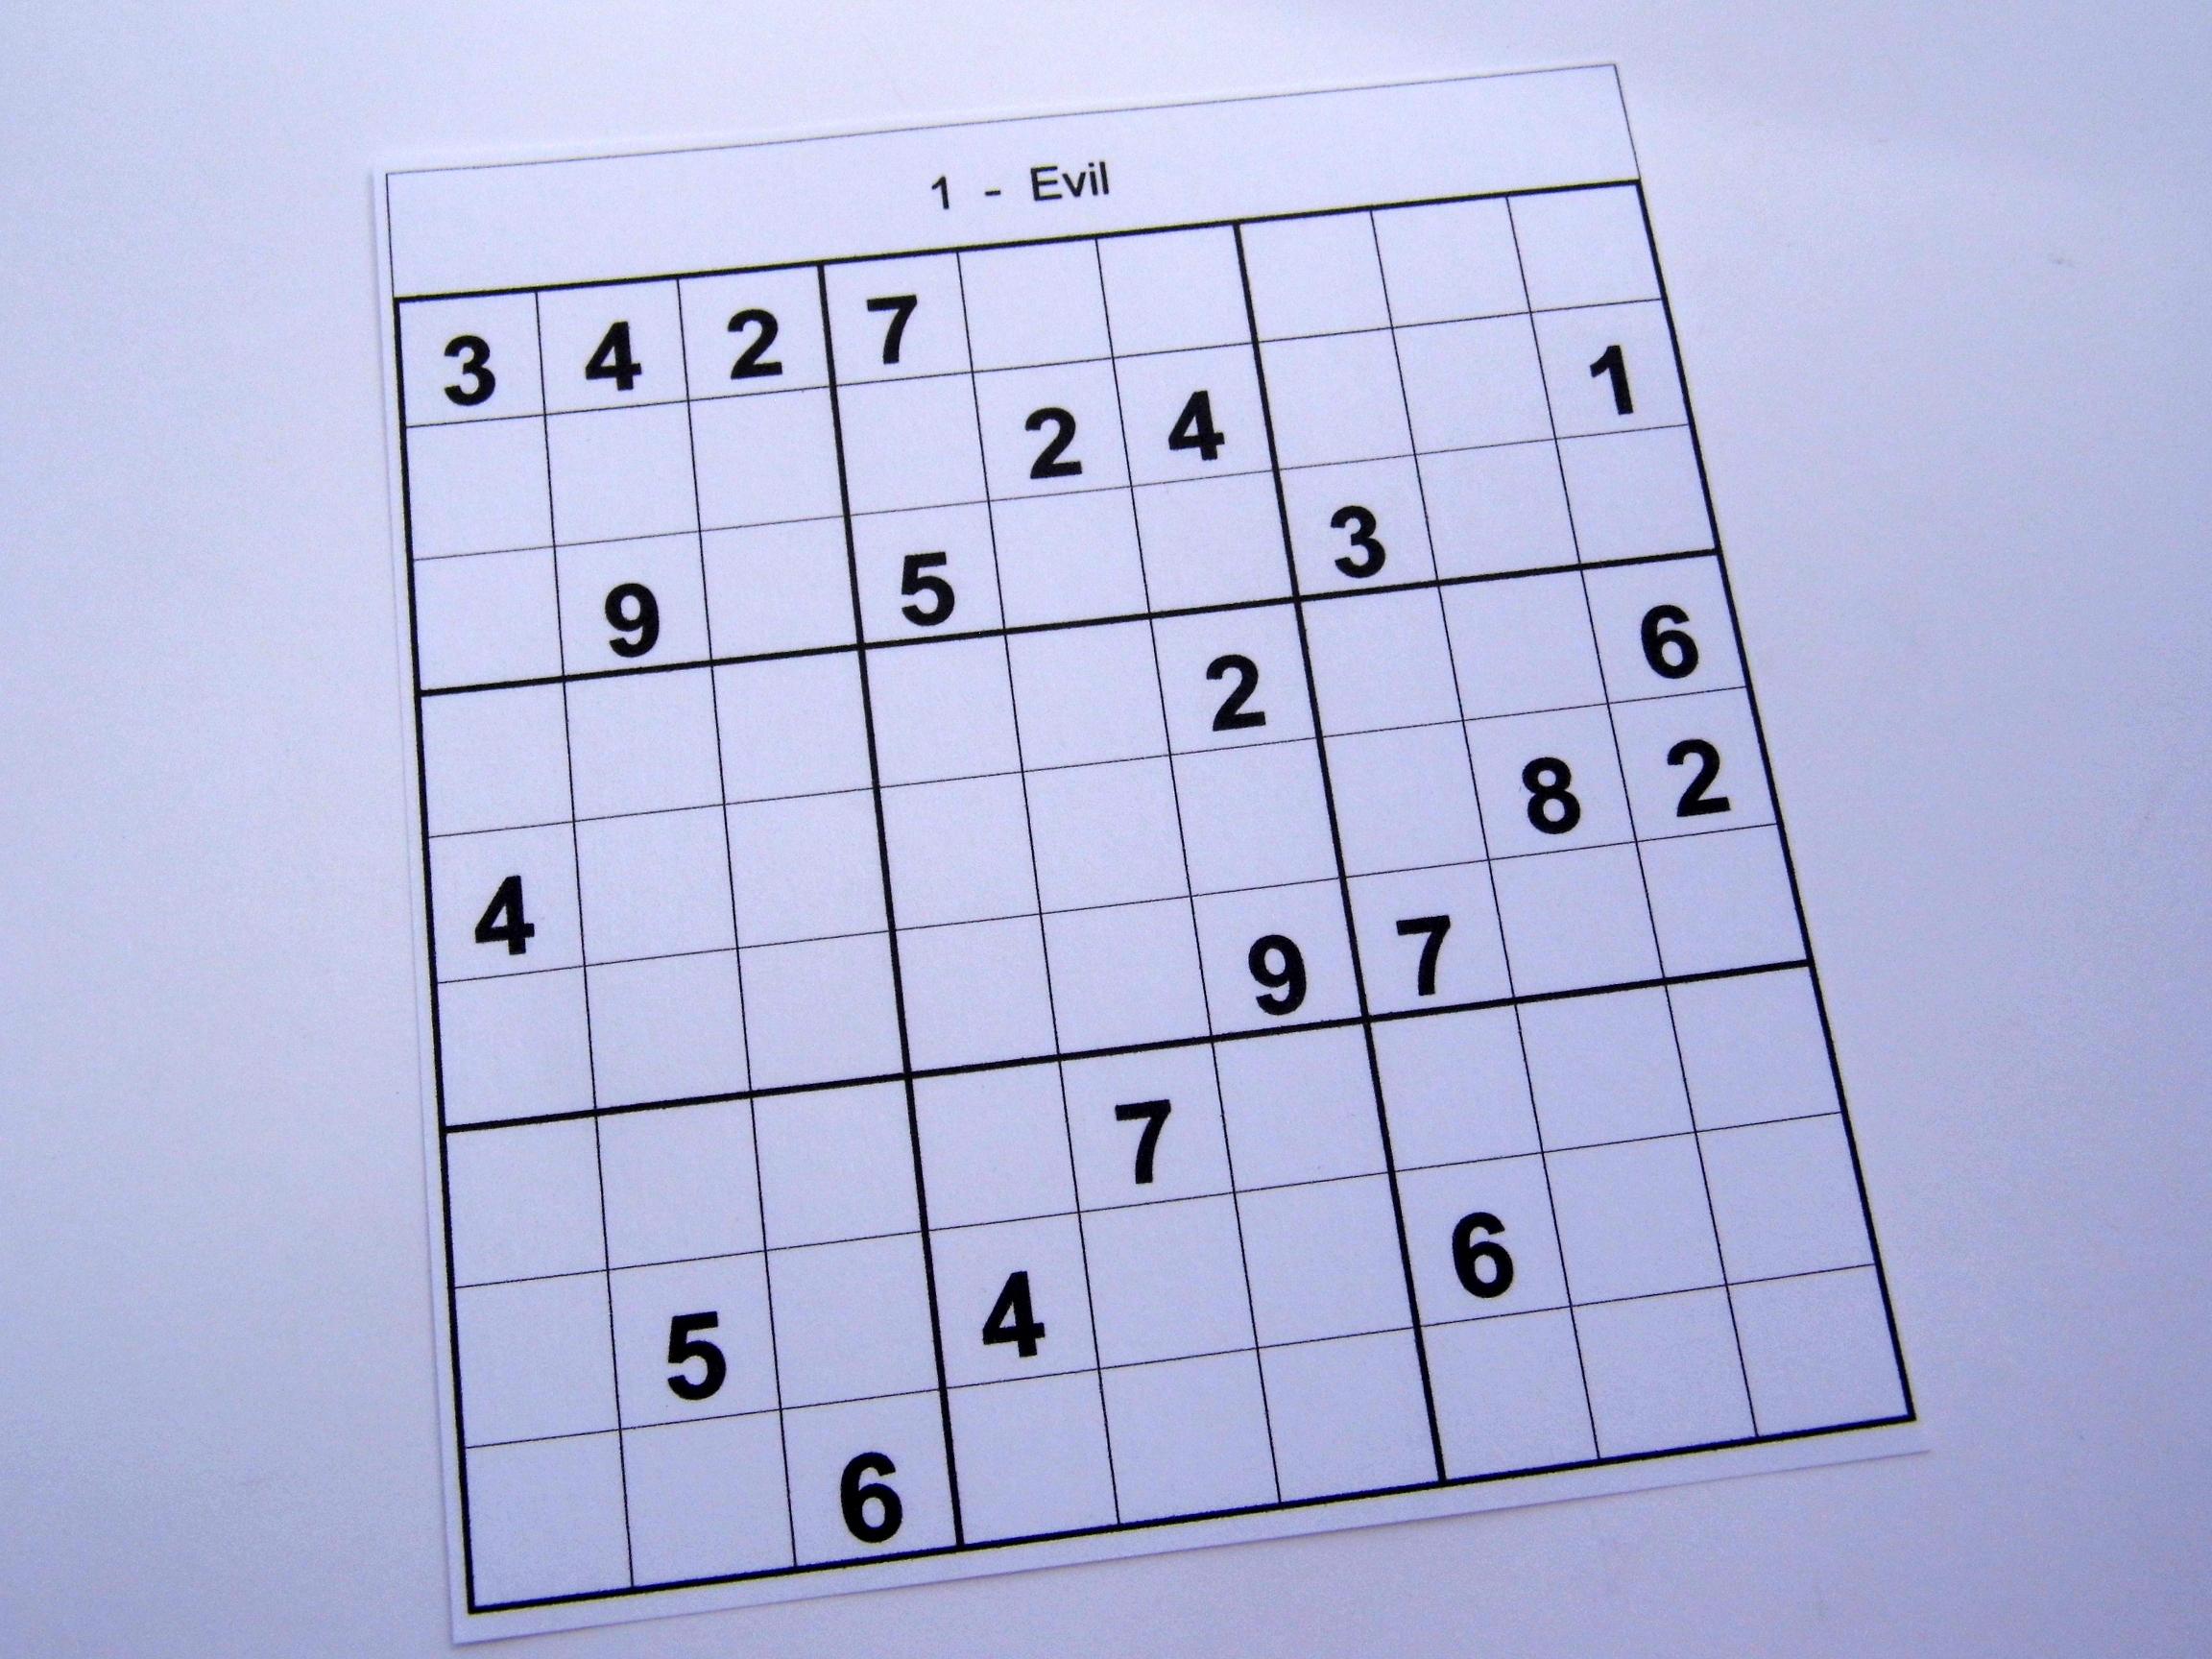 Hard Printable Sudoku Puzzles 2 Per Page – Book 1 – Free Sudoku Puzzles - Printable Sudoku Puzzles Very Hard